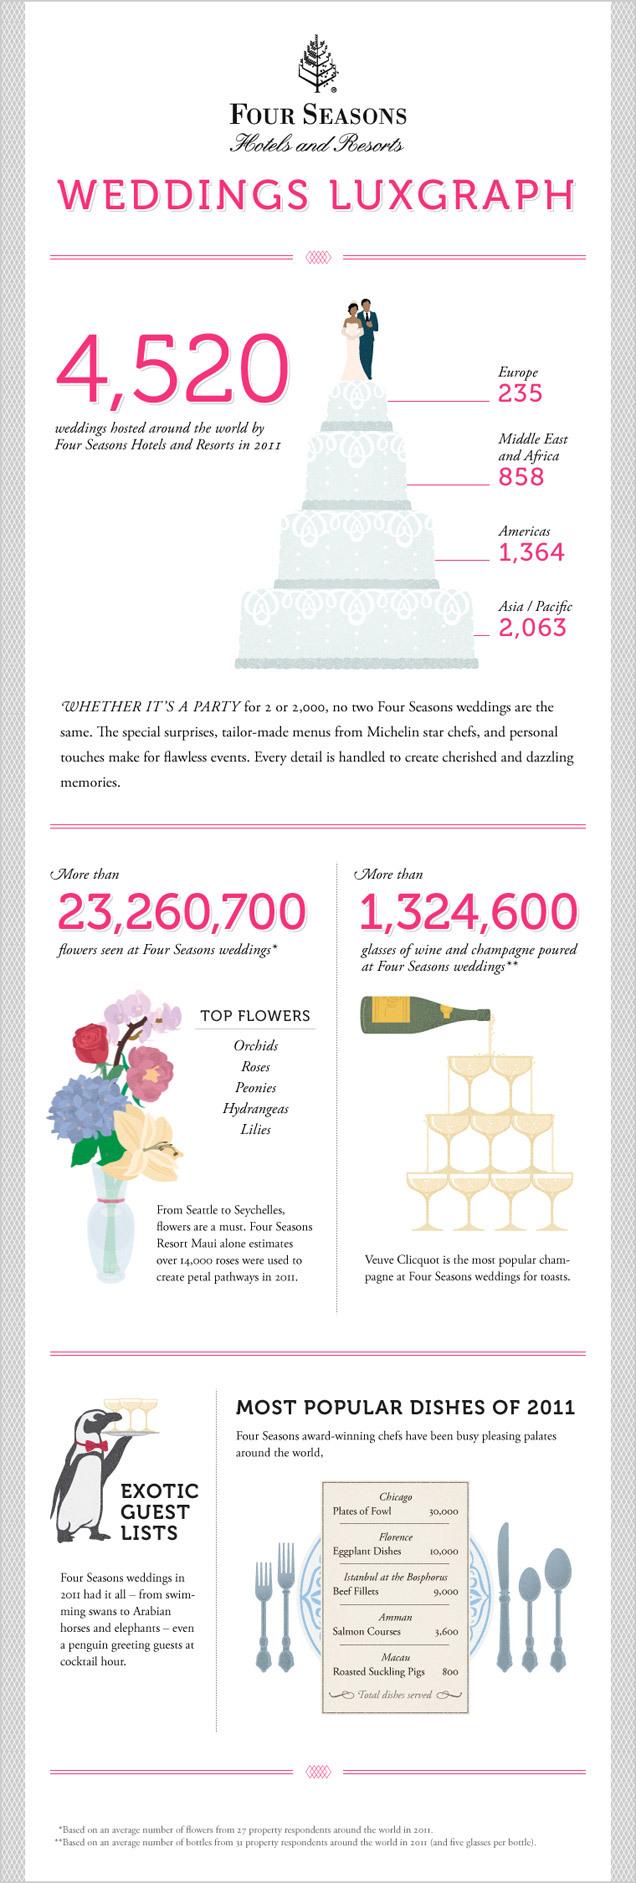 Four-seasons-weddings-infographic.full